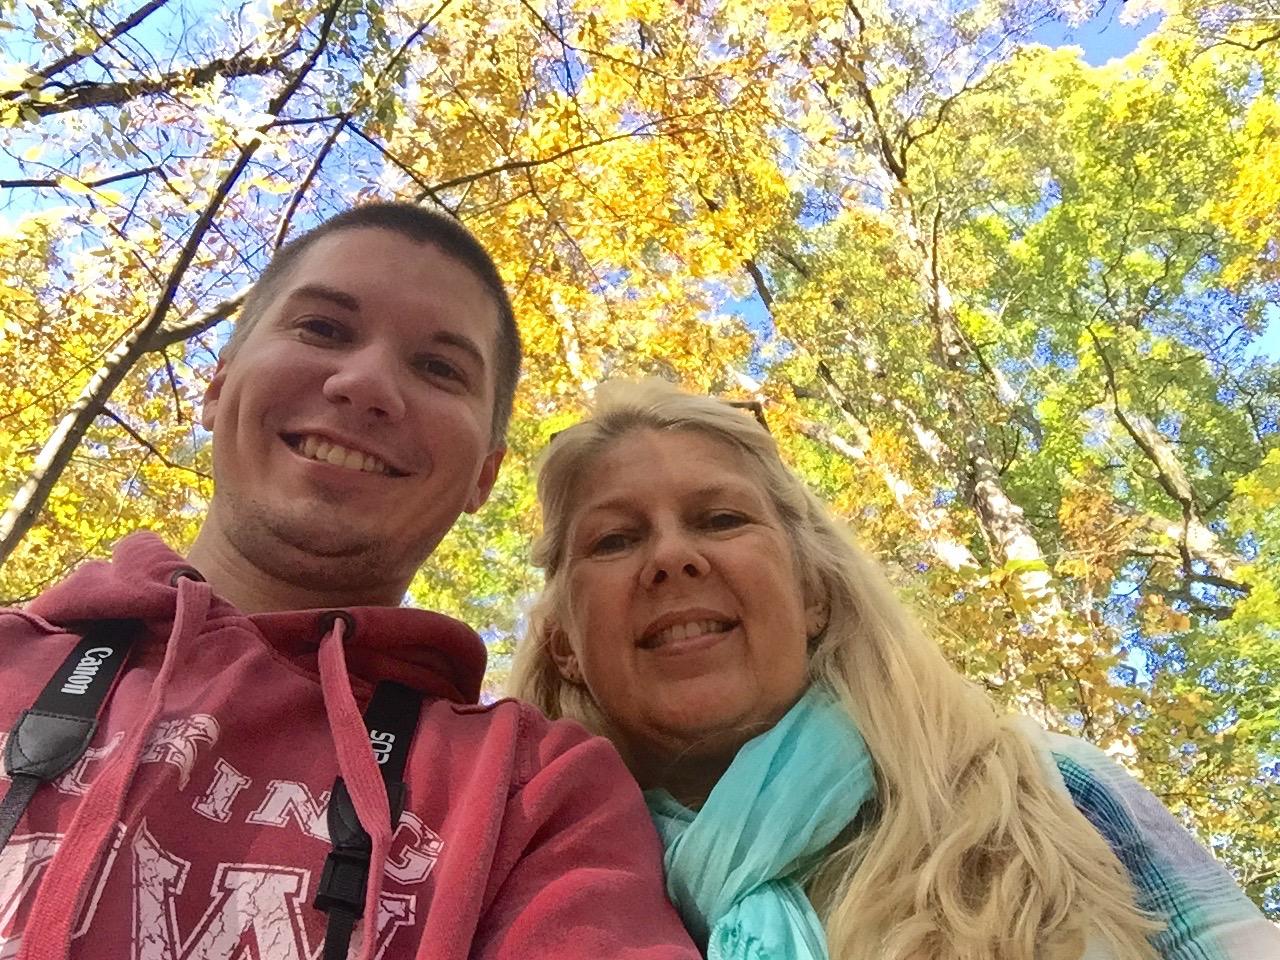 Sunday Adventure – Fall Colors Hike